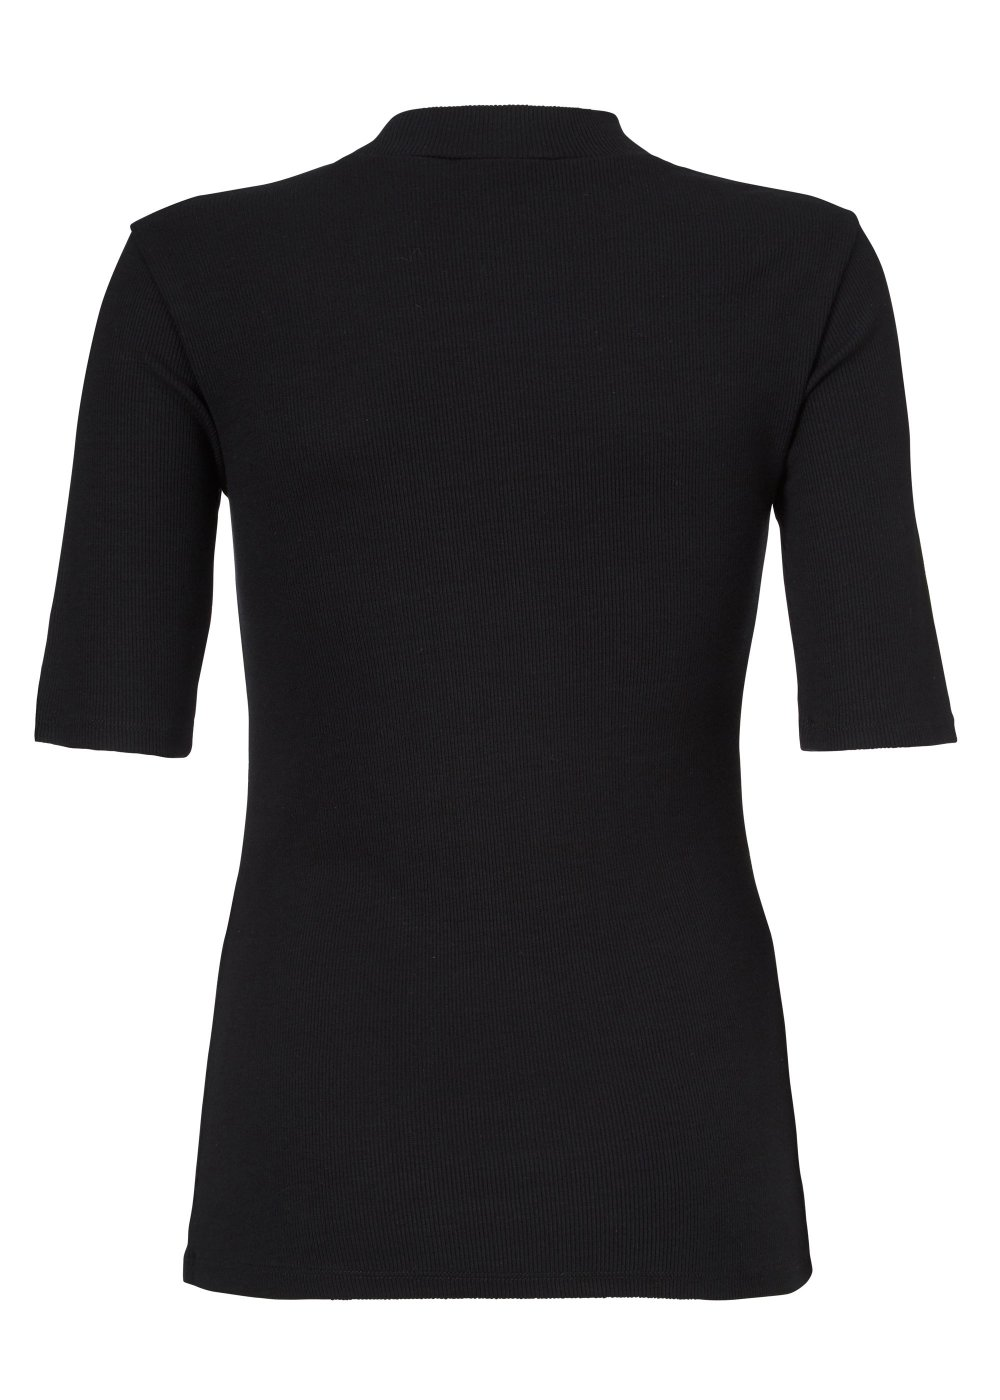 Modström Krown t-shirt, black, large